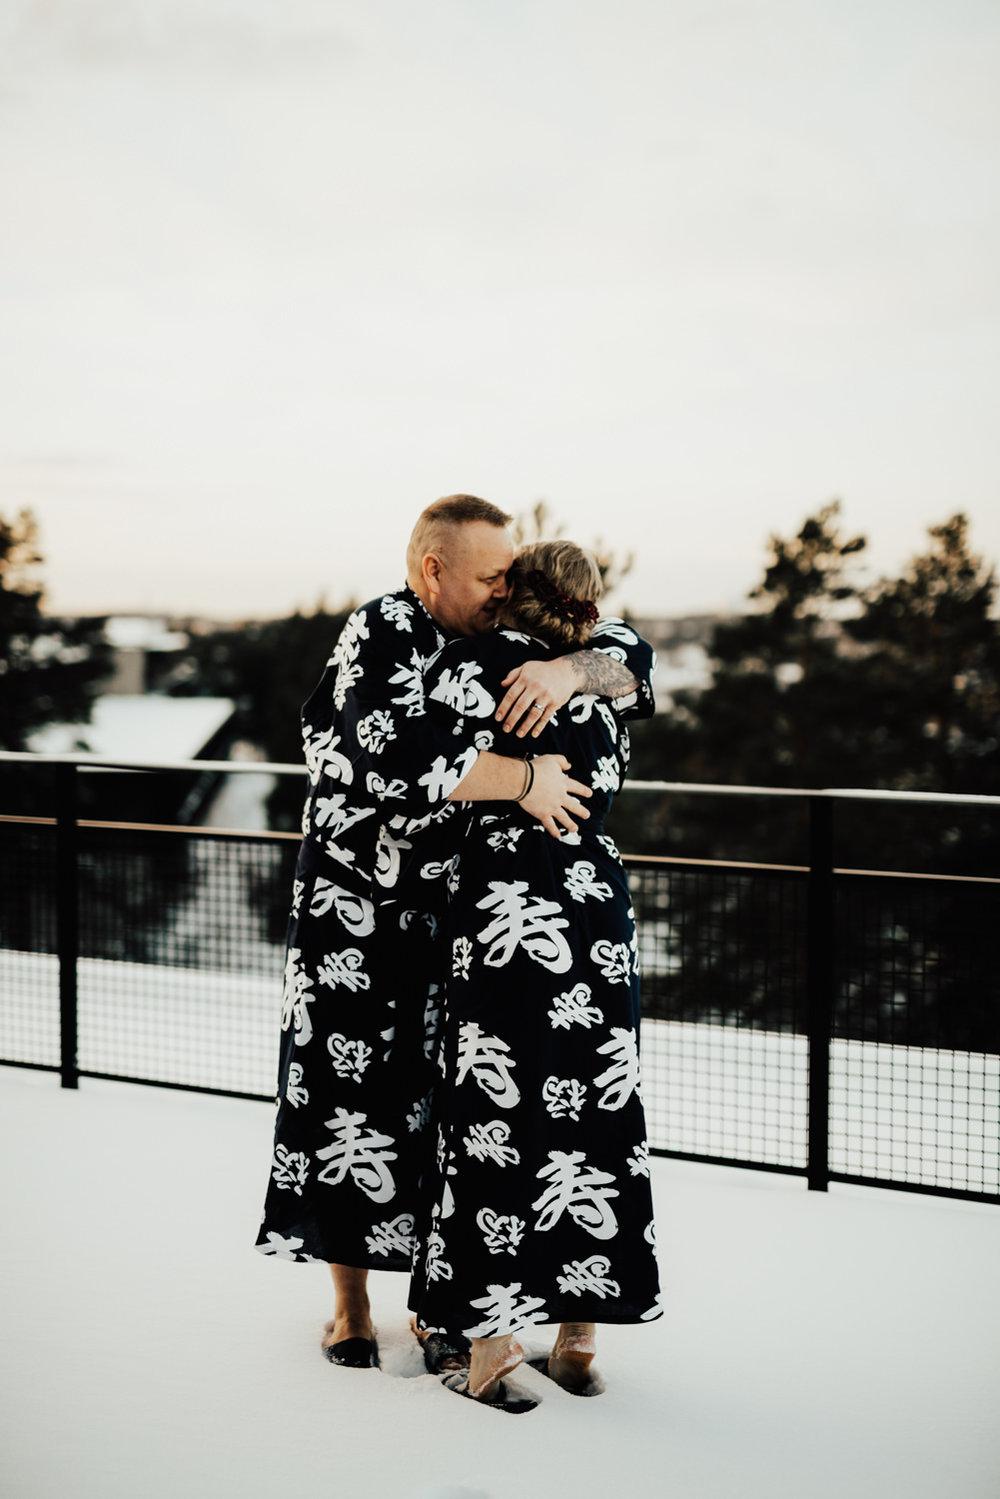 Linnsejphotography-fotograf-brollopsfotograf-brollop-stockholm-yasuragi-elopement-sweden-hemligt-brollop-borgerlig-vinterbrollop-vinter-brollopsinspiration--0021.jpg